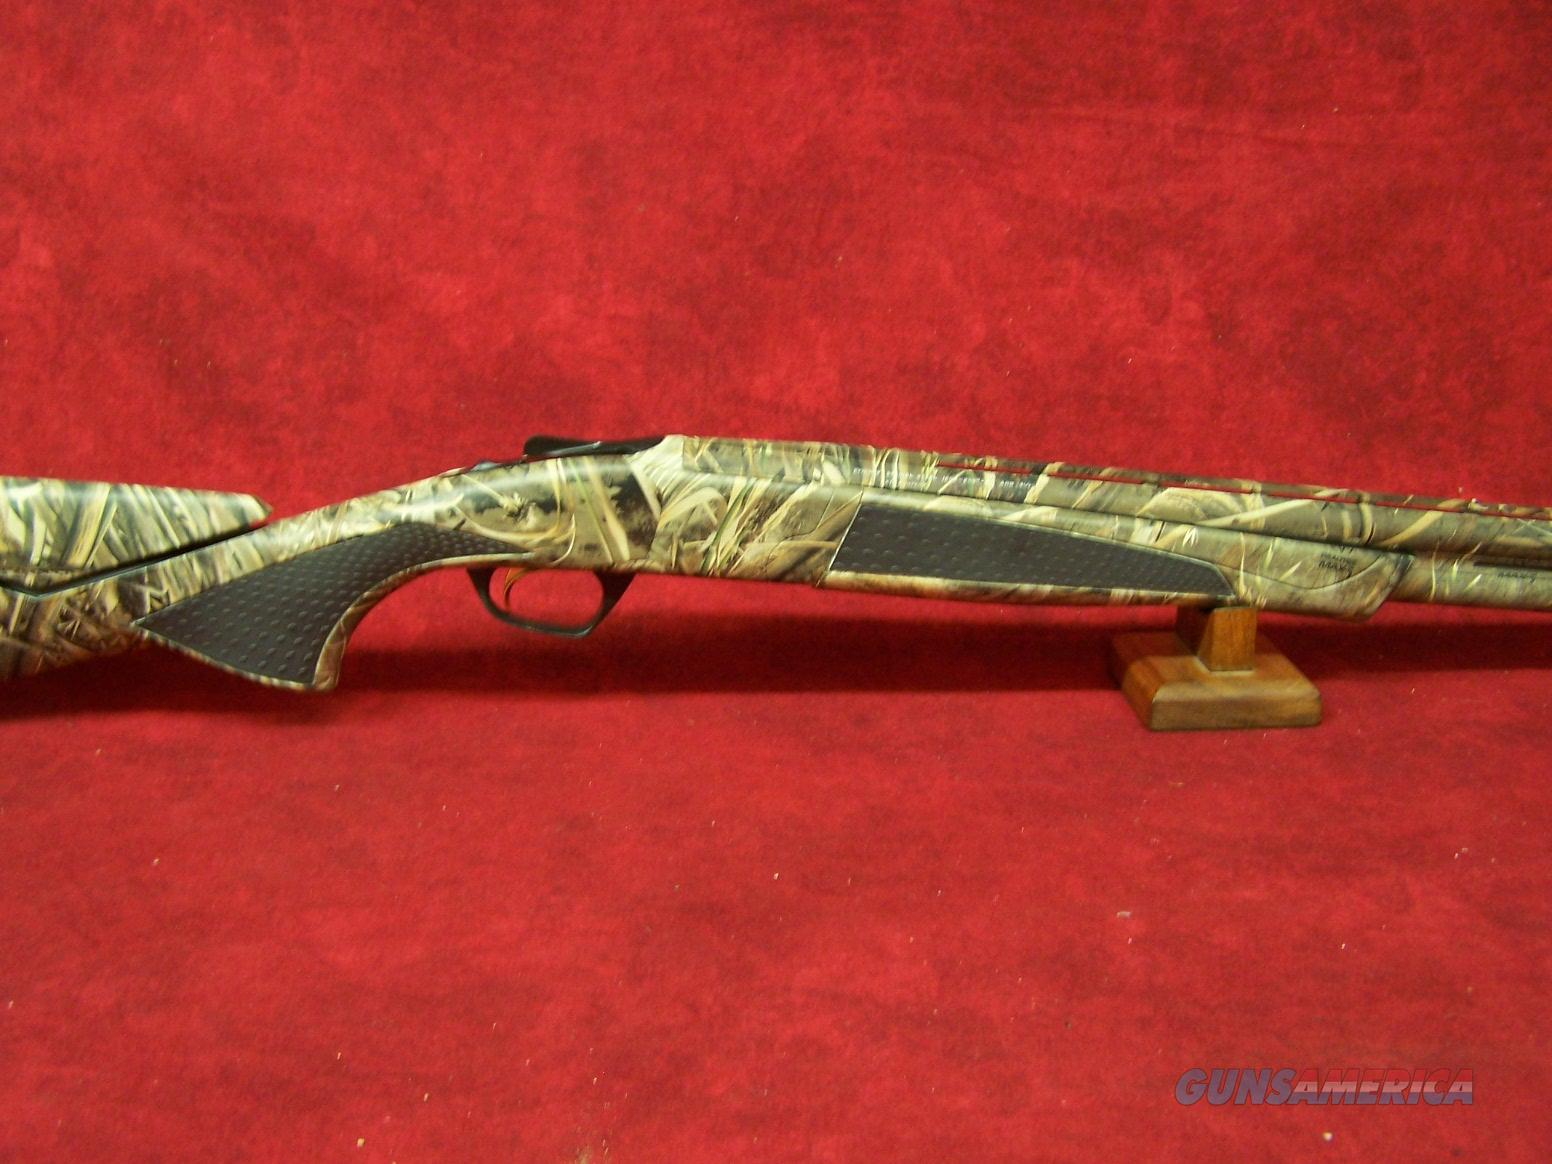 "Browning Cynergy Max 5 12ga 3 1/2"" 30"" (013713203)  Guns > Shotguns > Browning Shotguns > Over Unders > Cynergy > Hunting"